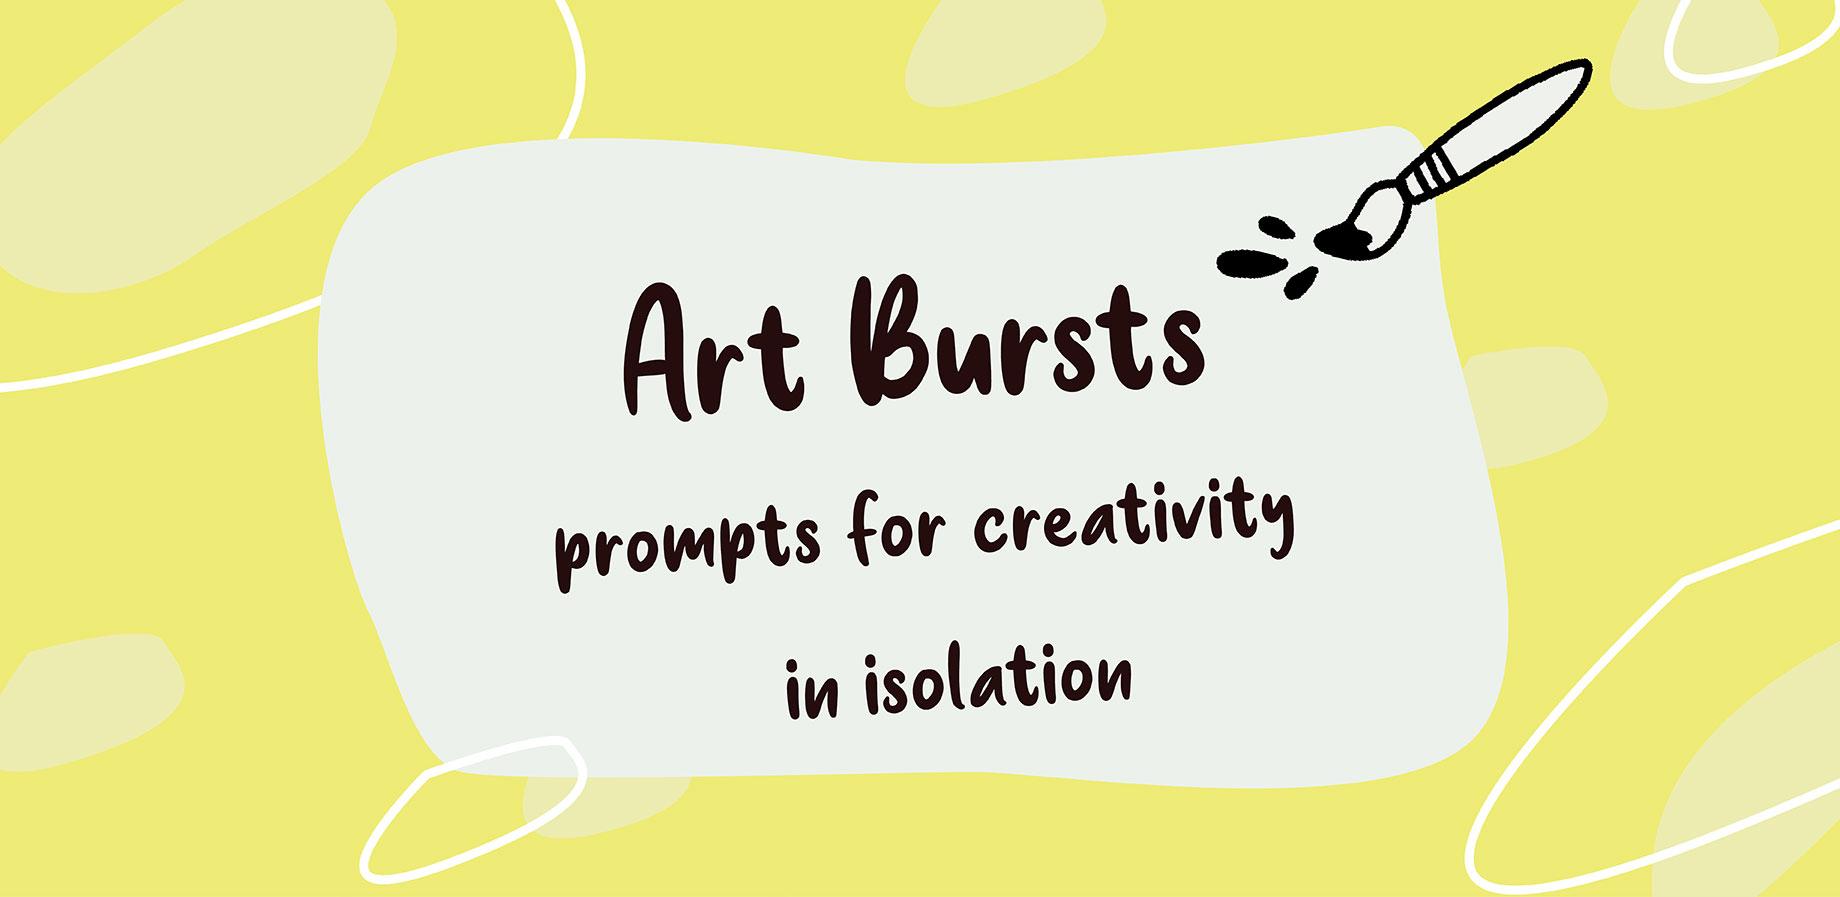 art busts